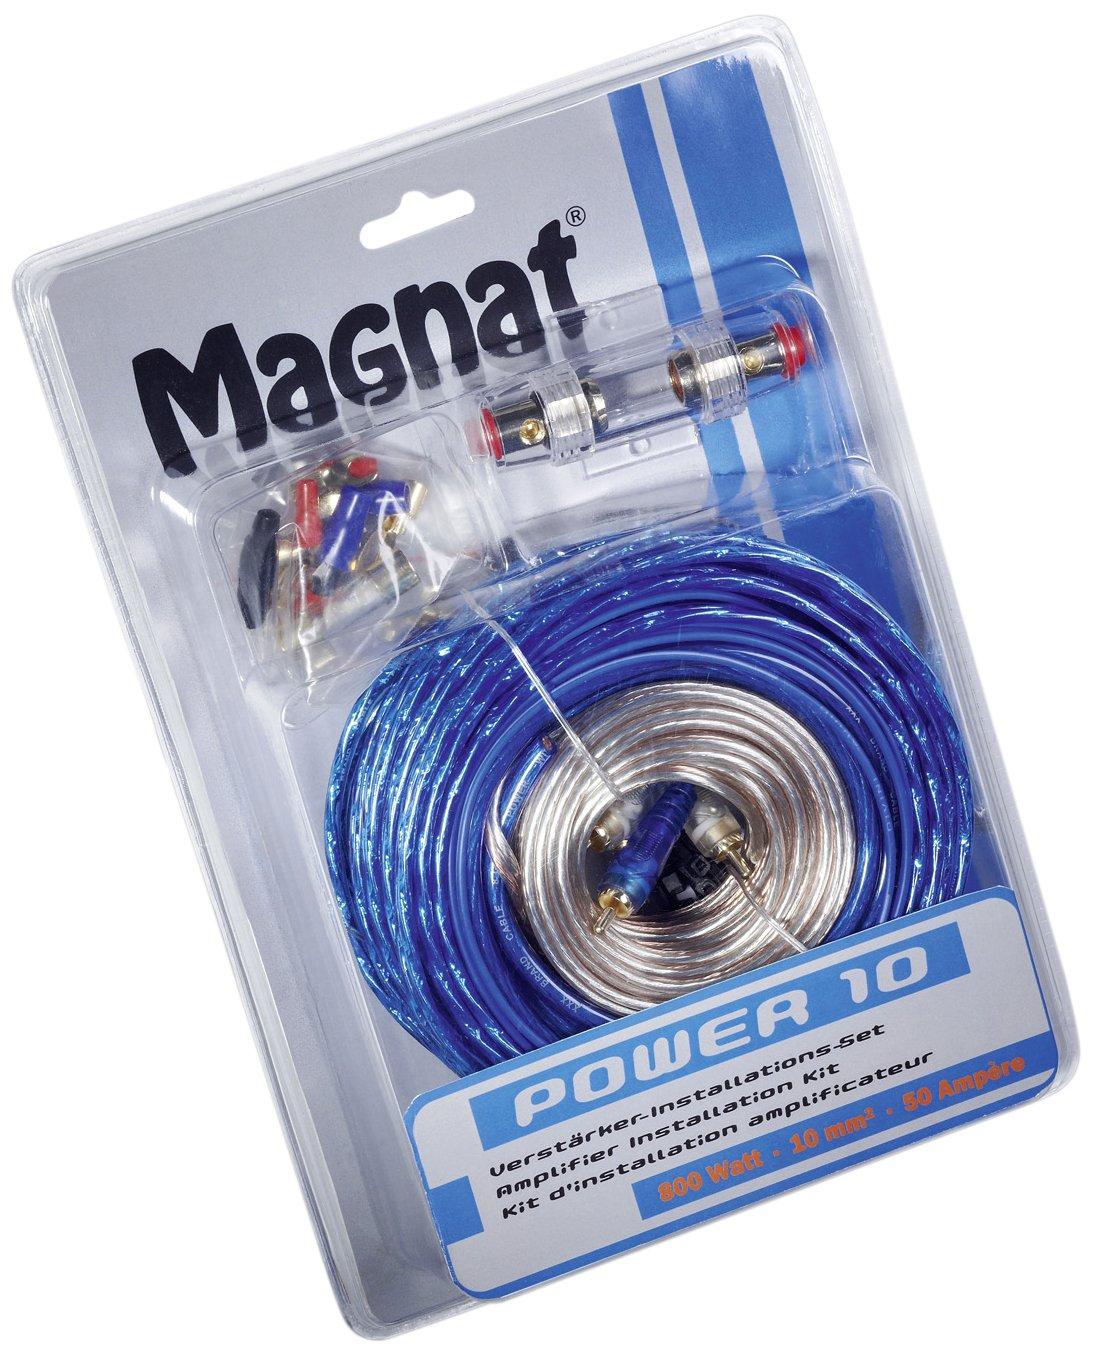 Magnat Power 10 Verkabelungsset für Endstufe: Amazon.de: Elektronik